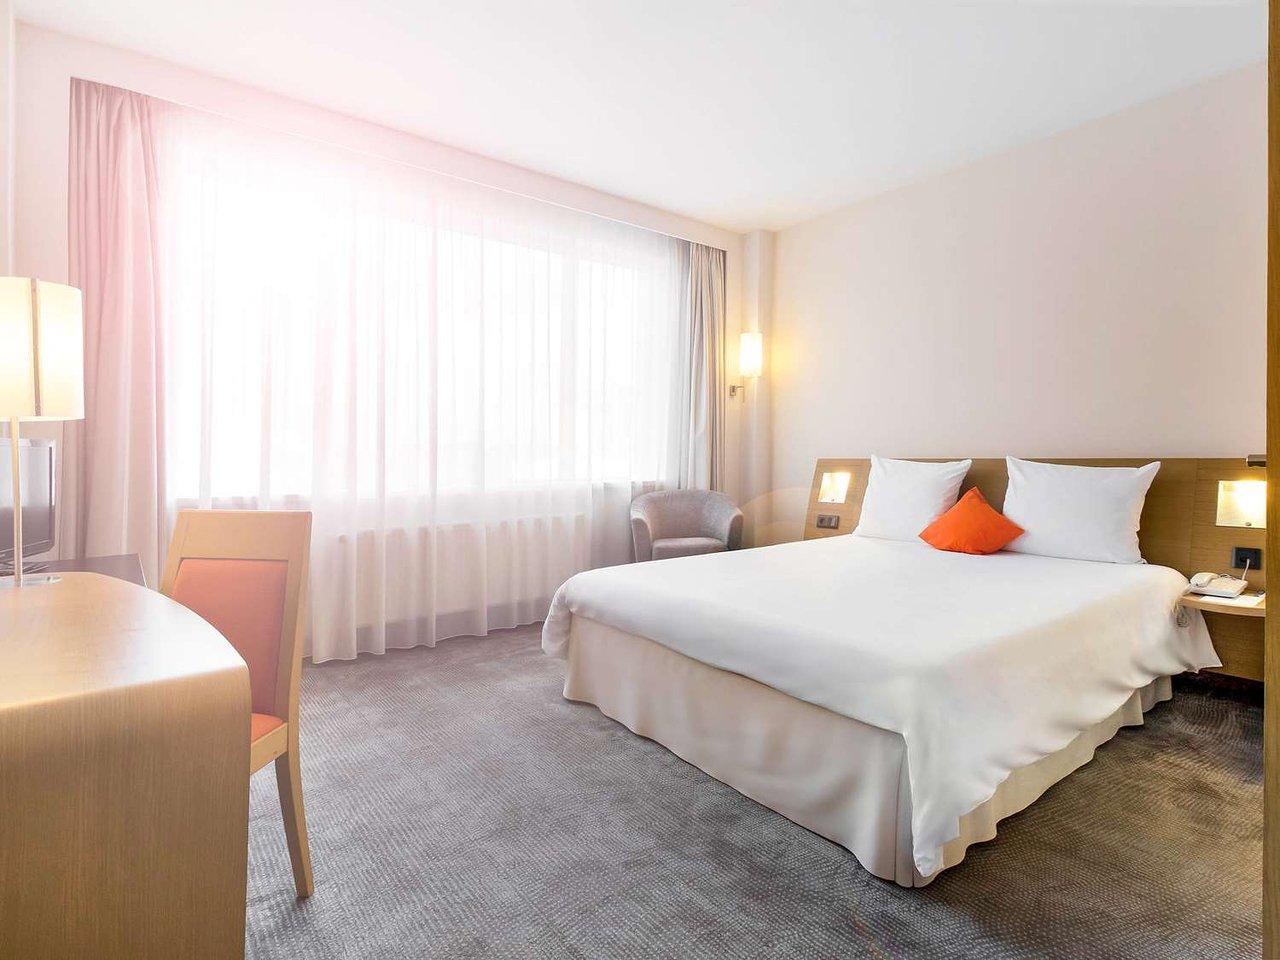 novotel st petersburg centre updated 2019 prices hotel reviews rh tripadvisor co uk